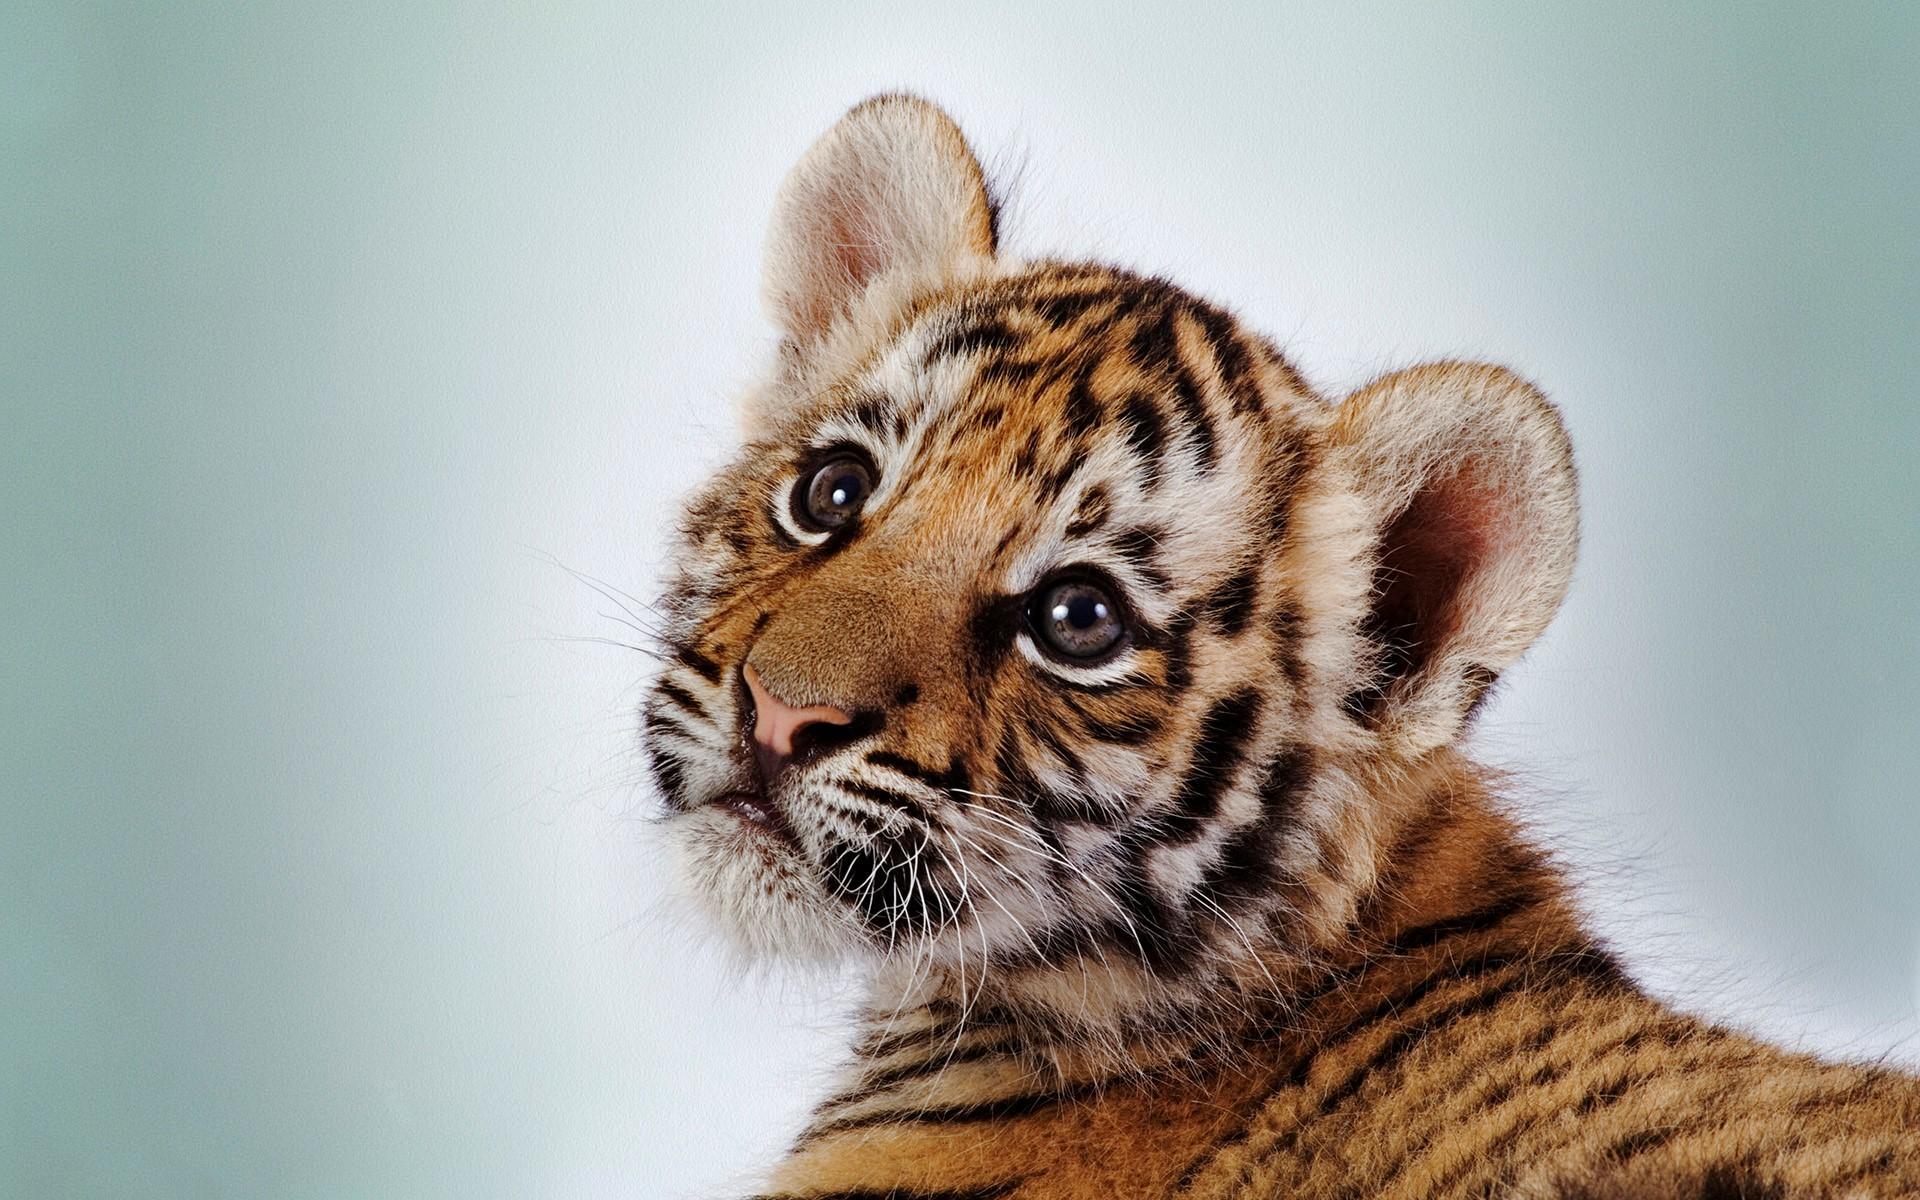 baby tiger wallpaper  Cute Baby Tiger Wallpaper (68  images)